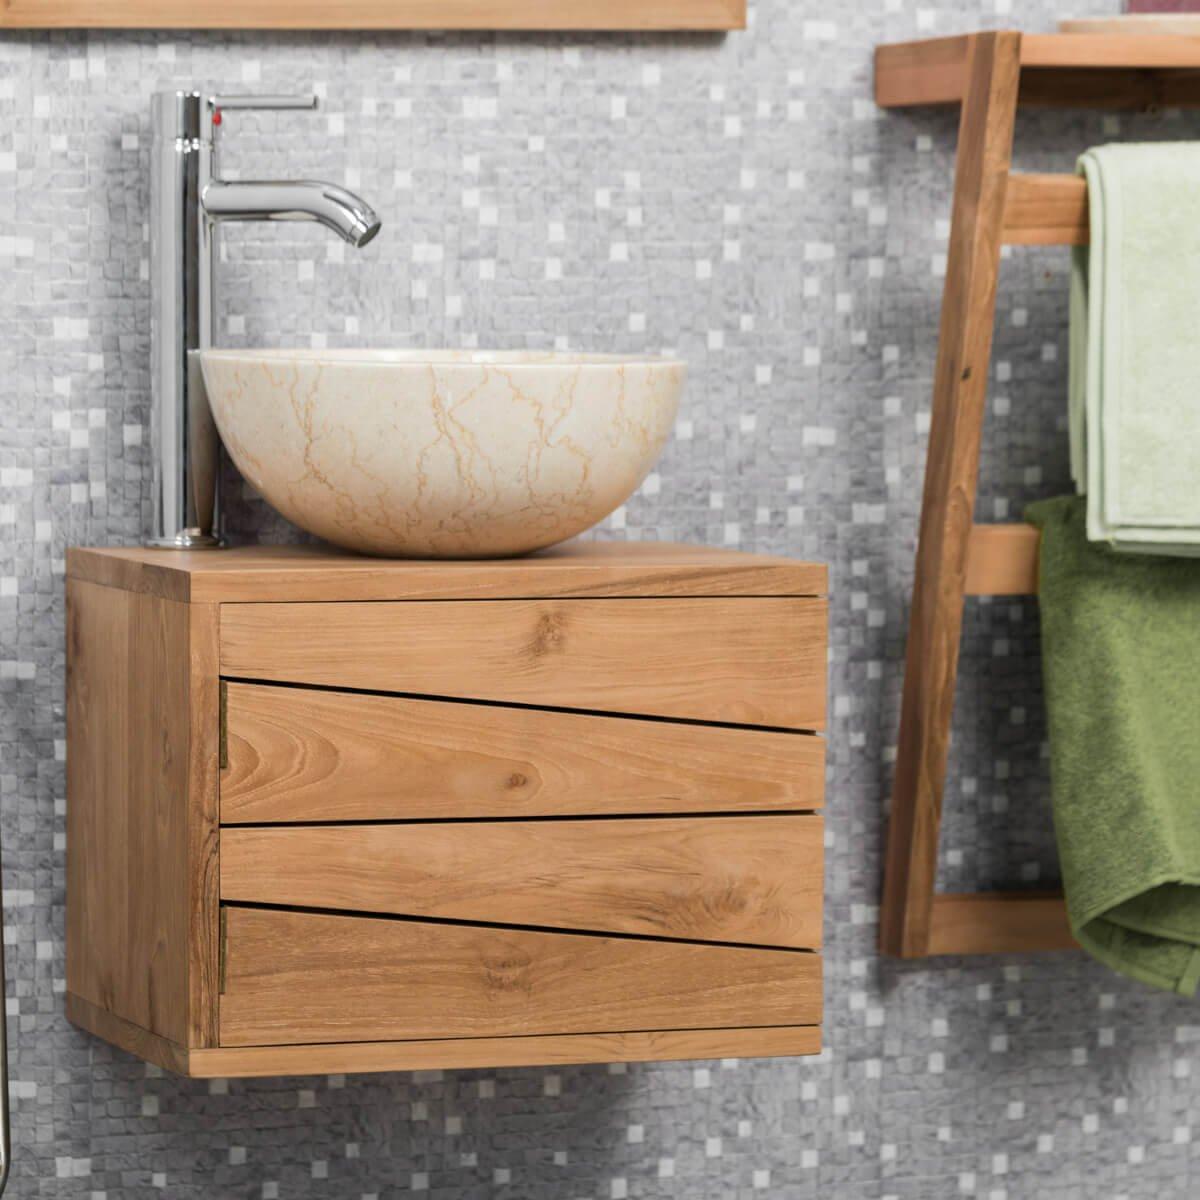 Magasin Salle De Bain Lille ~ meuble de salle de bain suspendu en teck cosy 40cm amazon fr